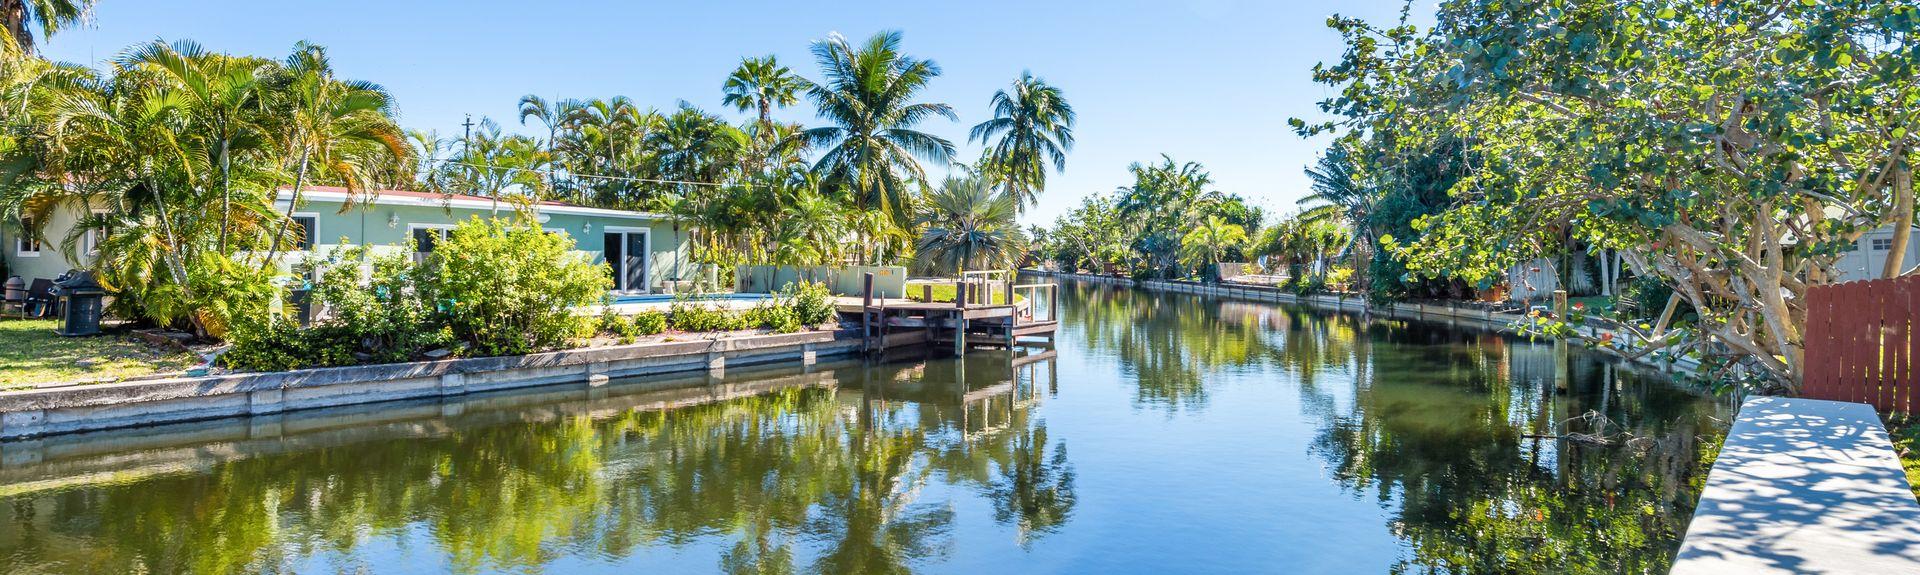 Lauderdale Lakes, FL, USA